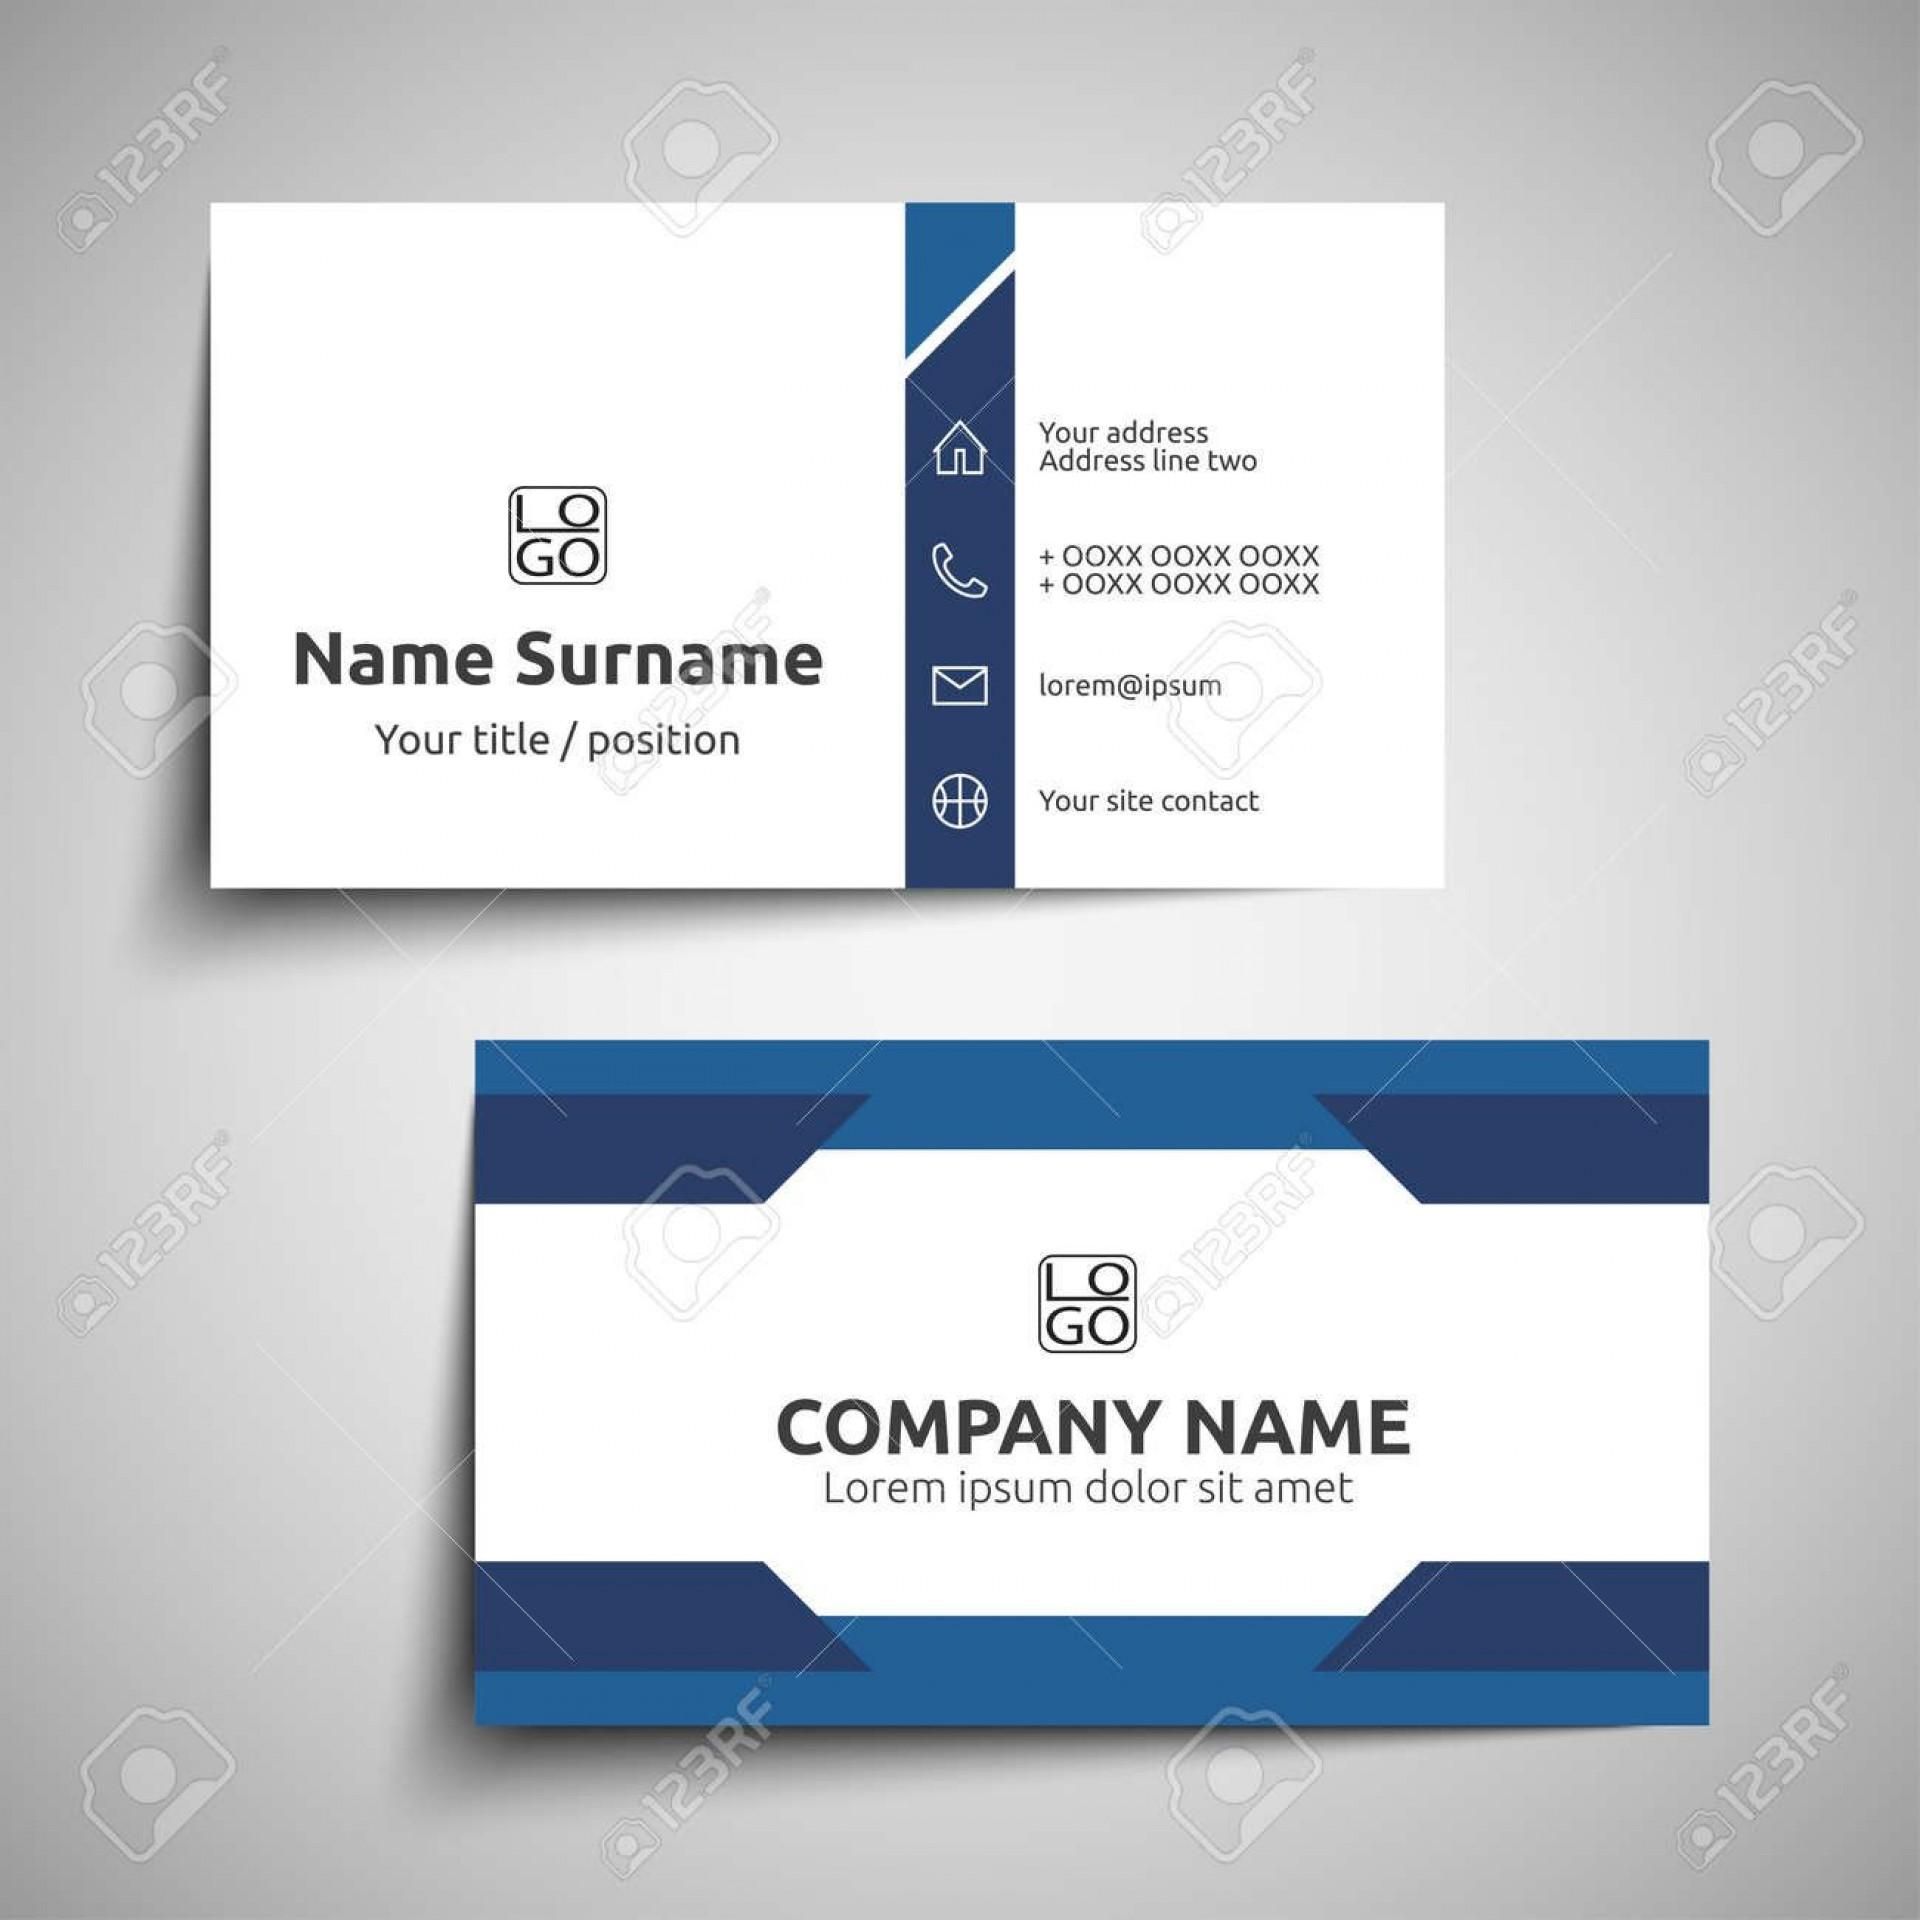 000 Excellent Simple Visiting Card Design Photo  Busines Idea Psd File Free Download1920